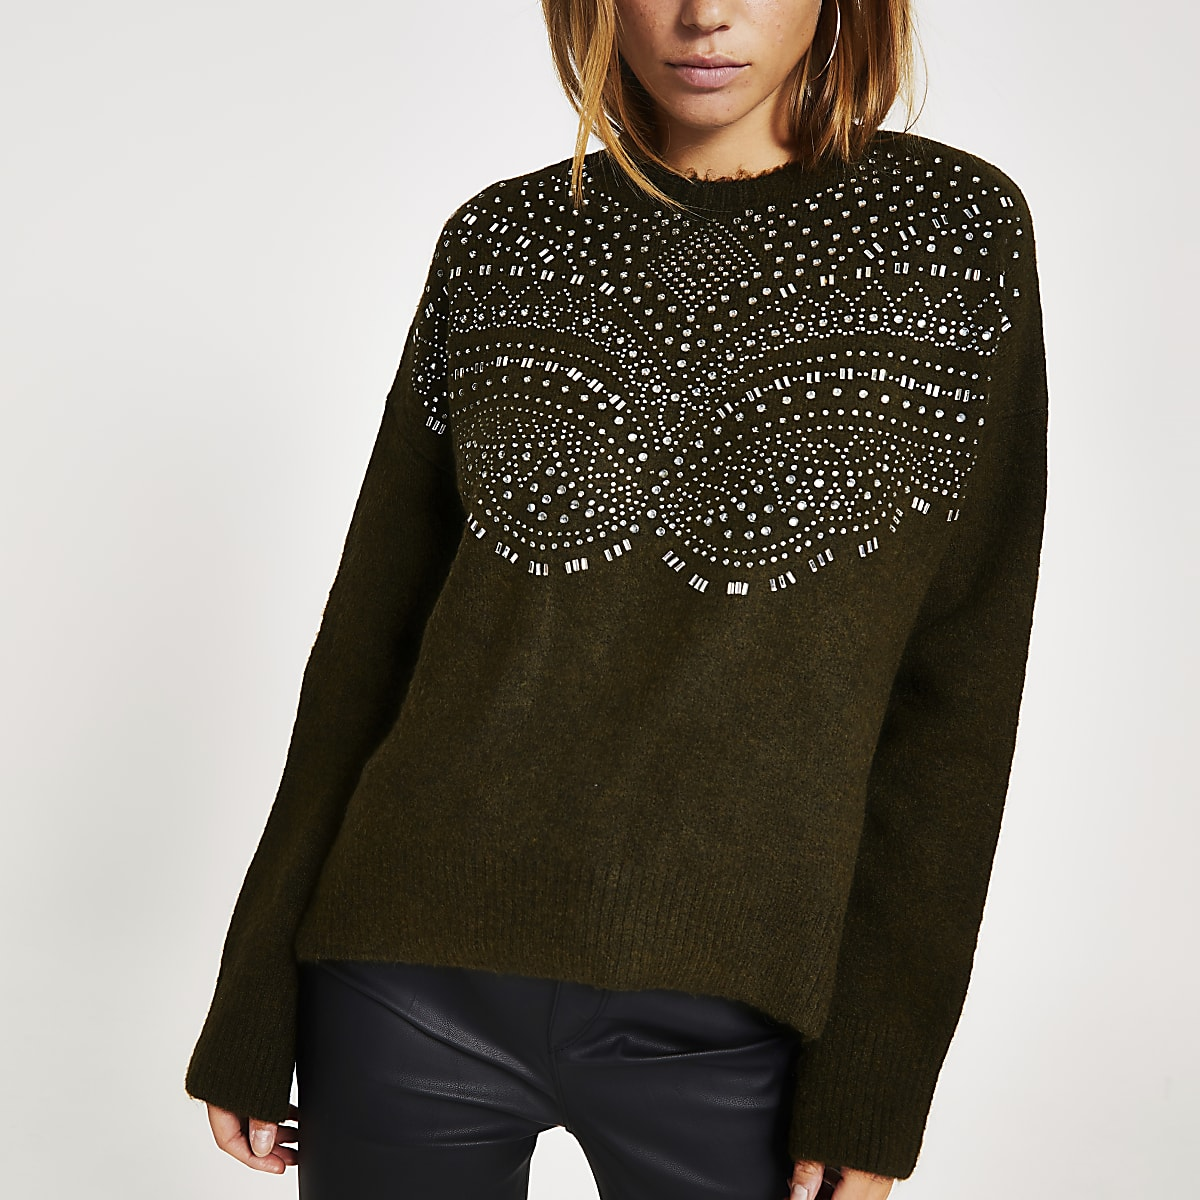 Khaki embellished long sleeve knitted jumper